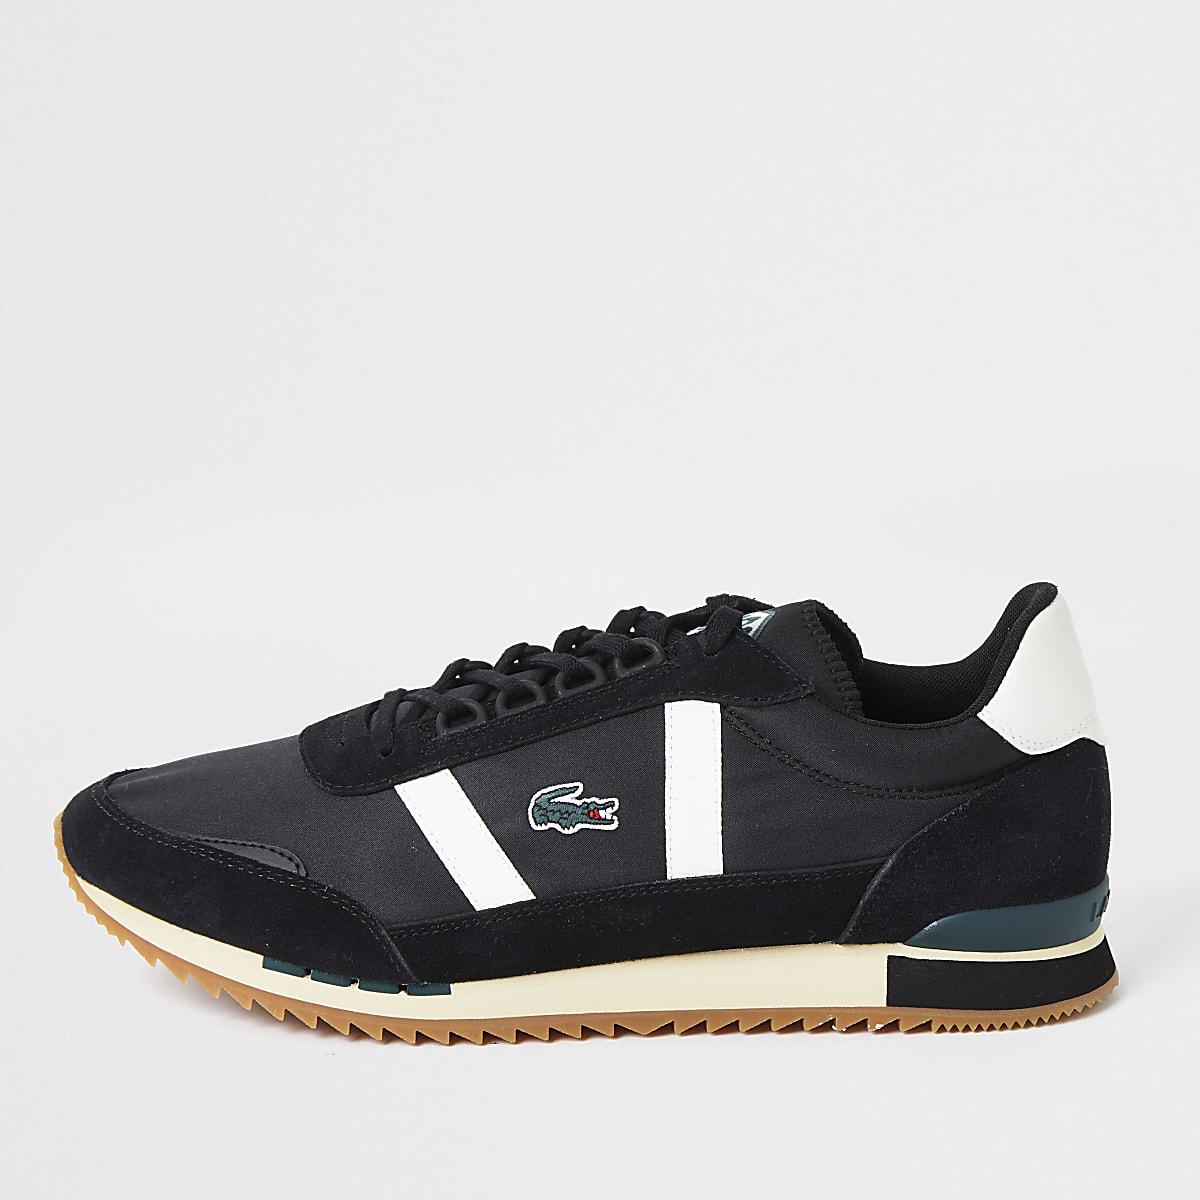 Lacoste - Partner Retro - zwarte sneakers